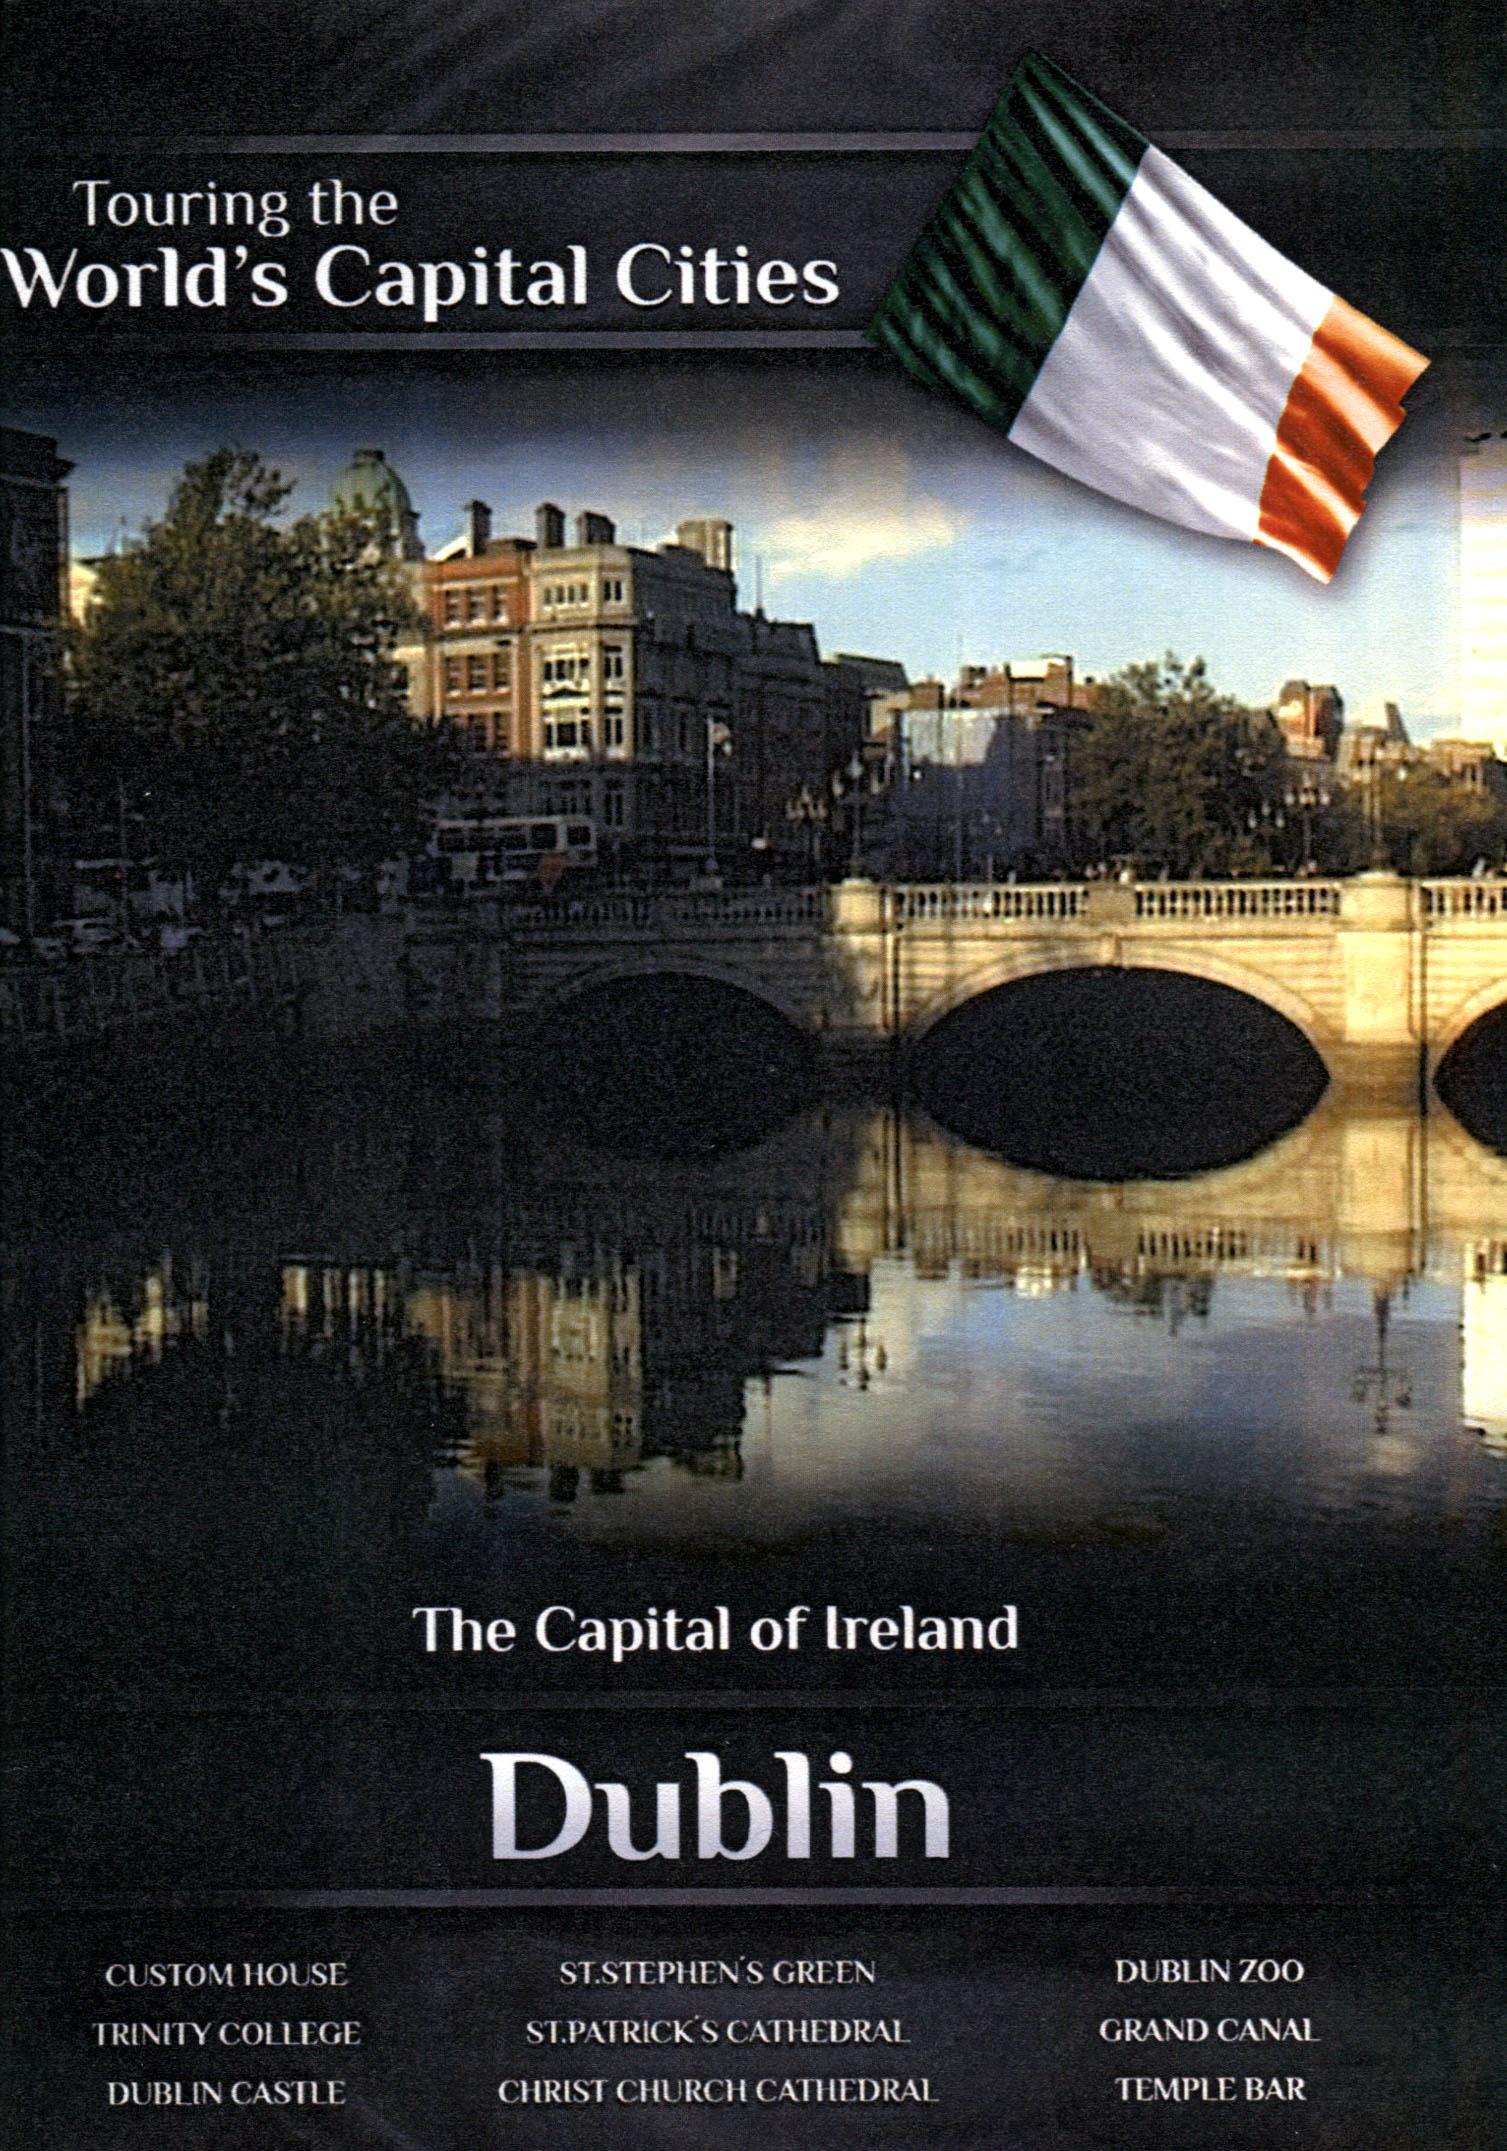 Touring the World's Capital Cities: The Capital of Ireland - Dublin